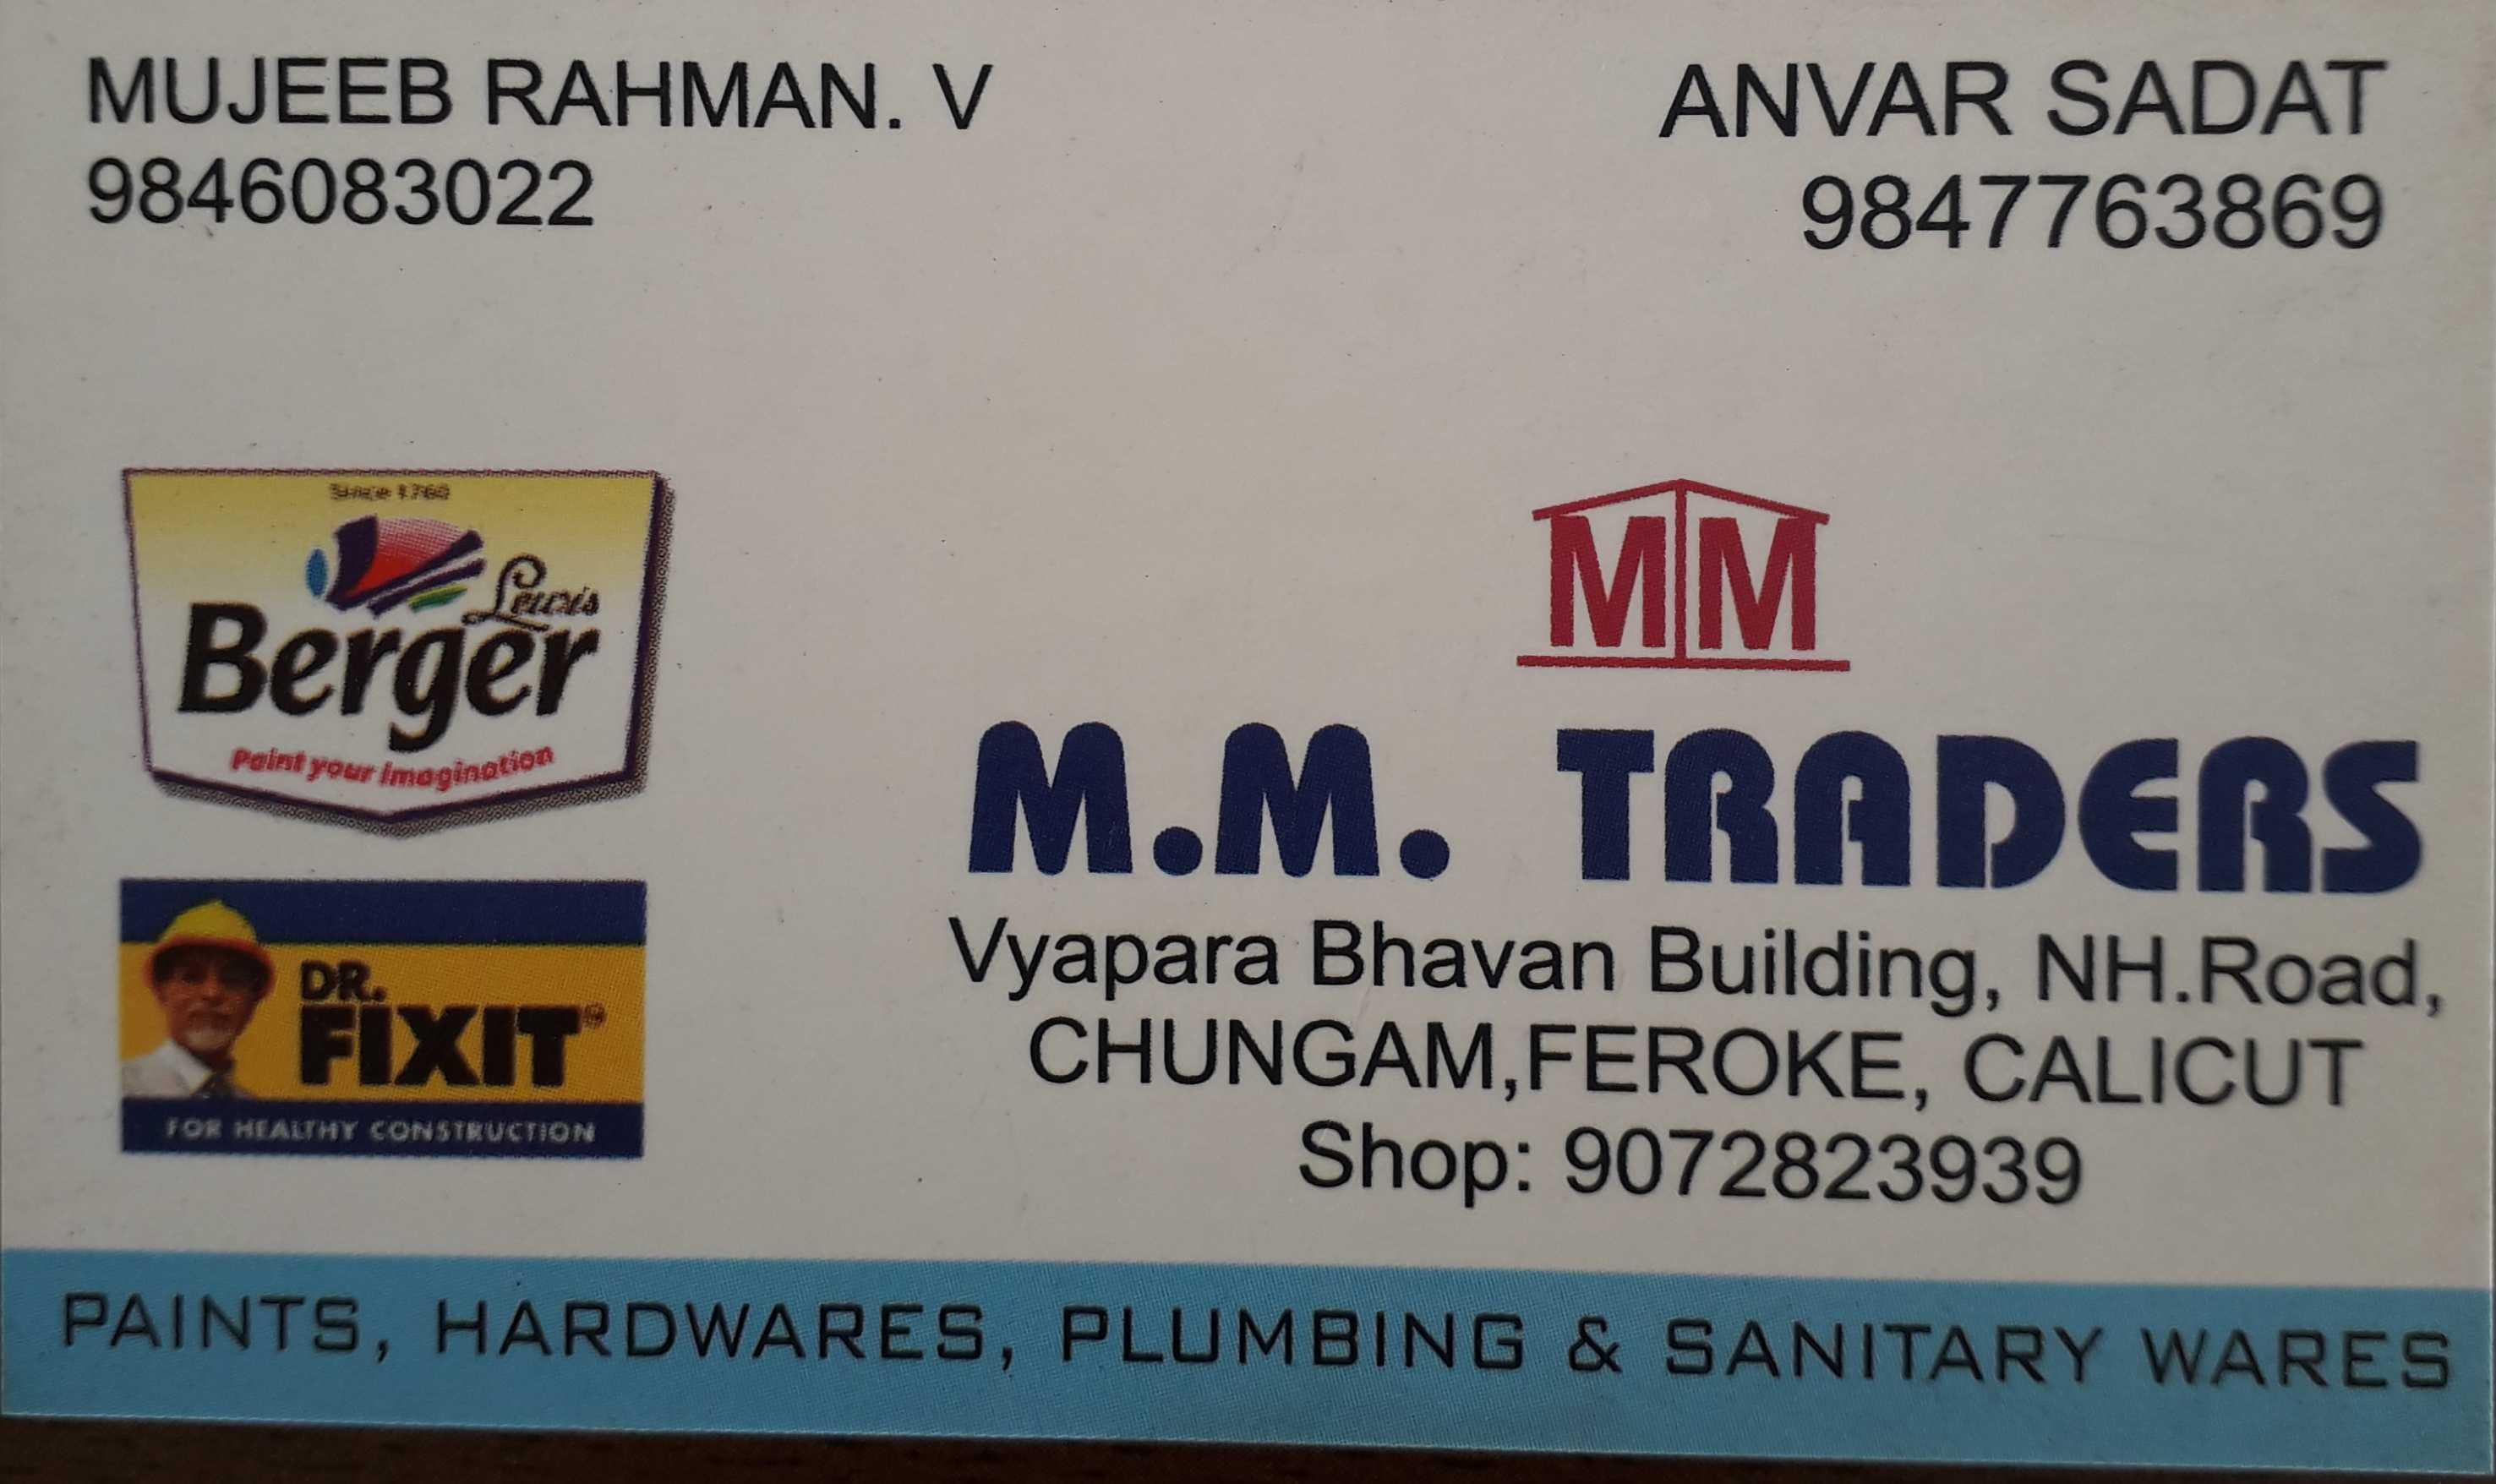 M.M. TRADERS, PAINT SHOP,  service in Ramanattukara, Kozhikode